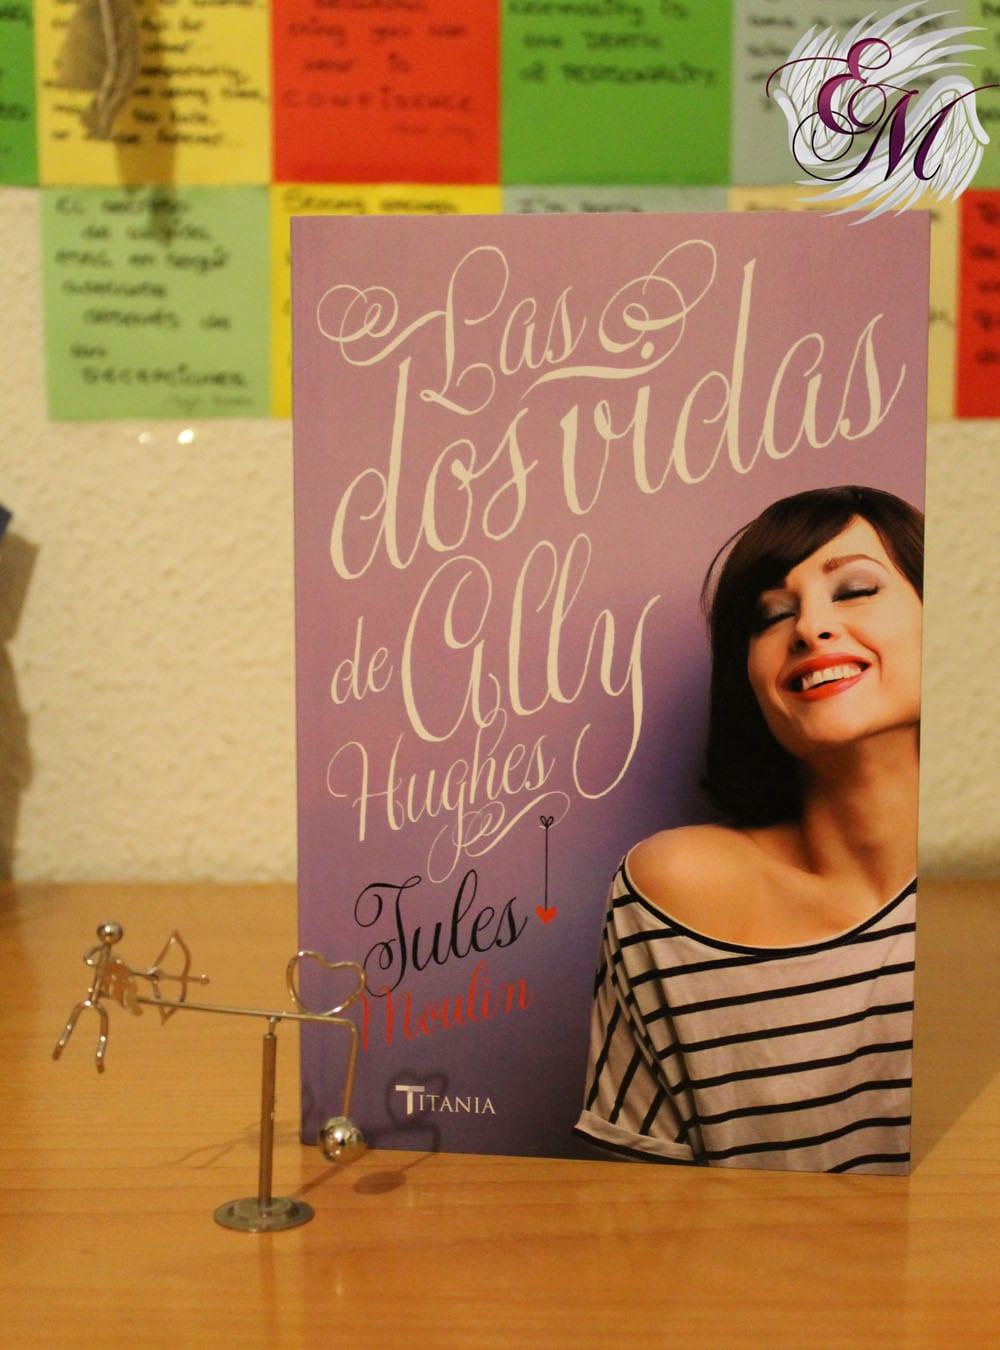 Las dos vidas de Ally Hughes, de Jules Moulin – Reseña